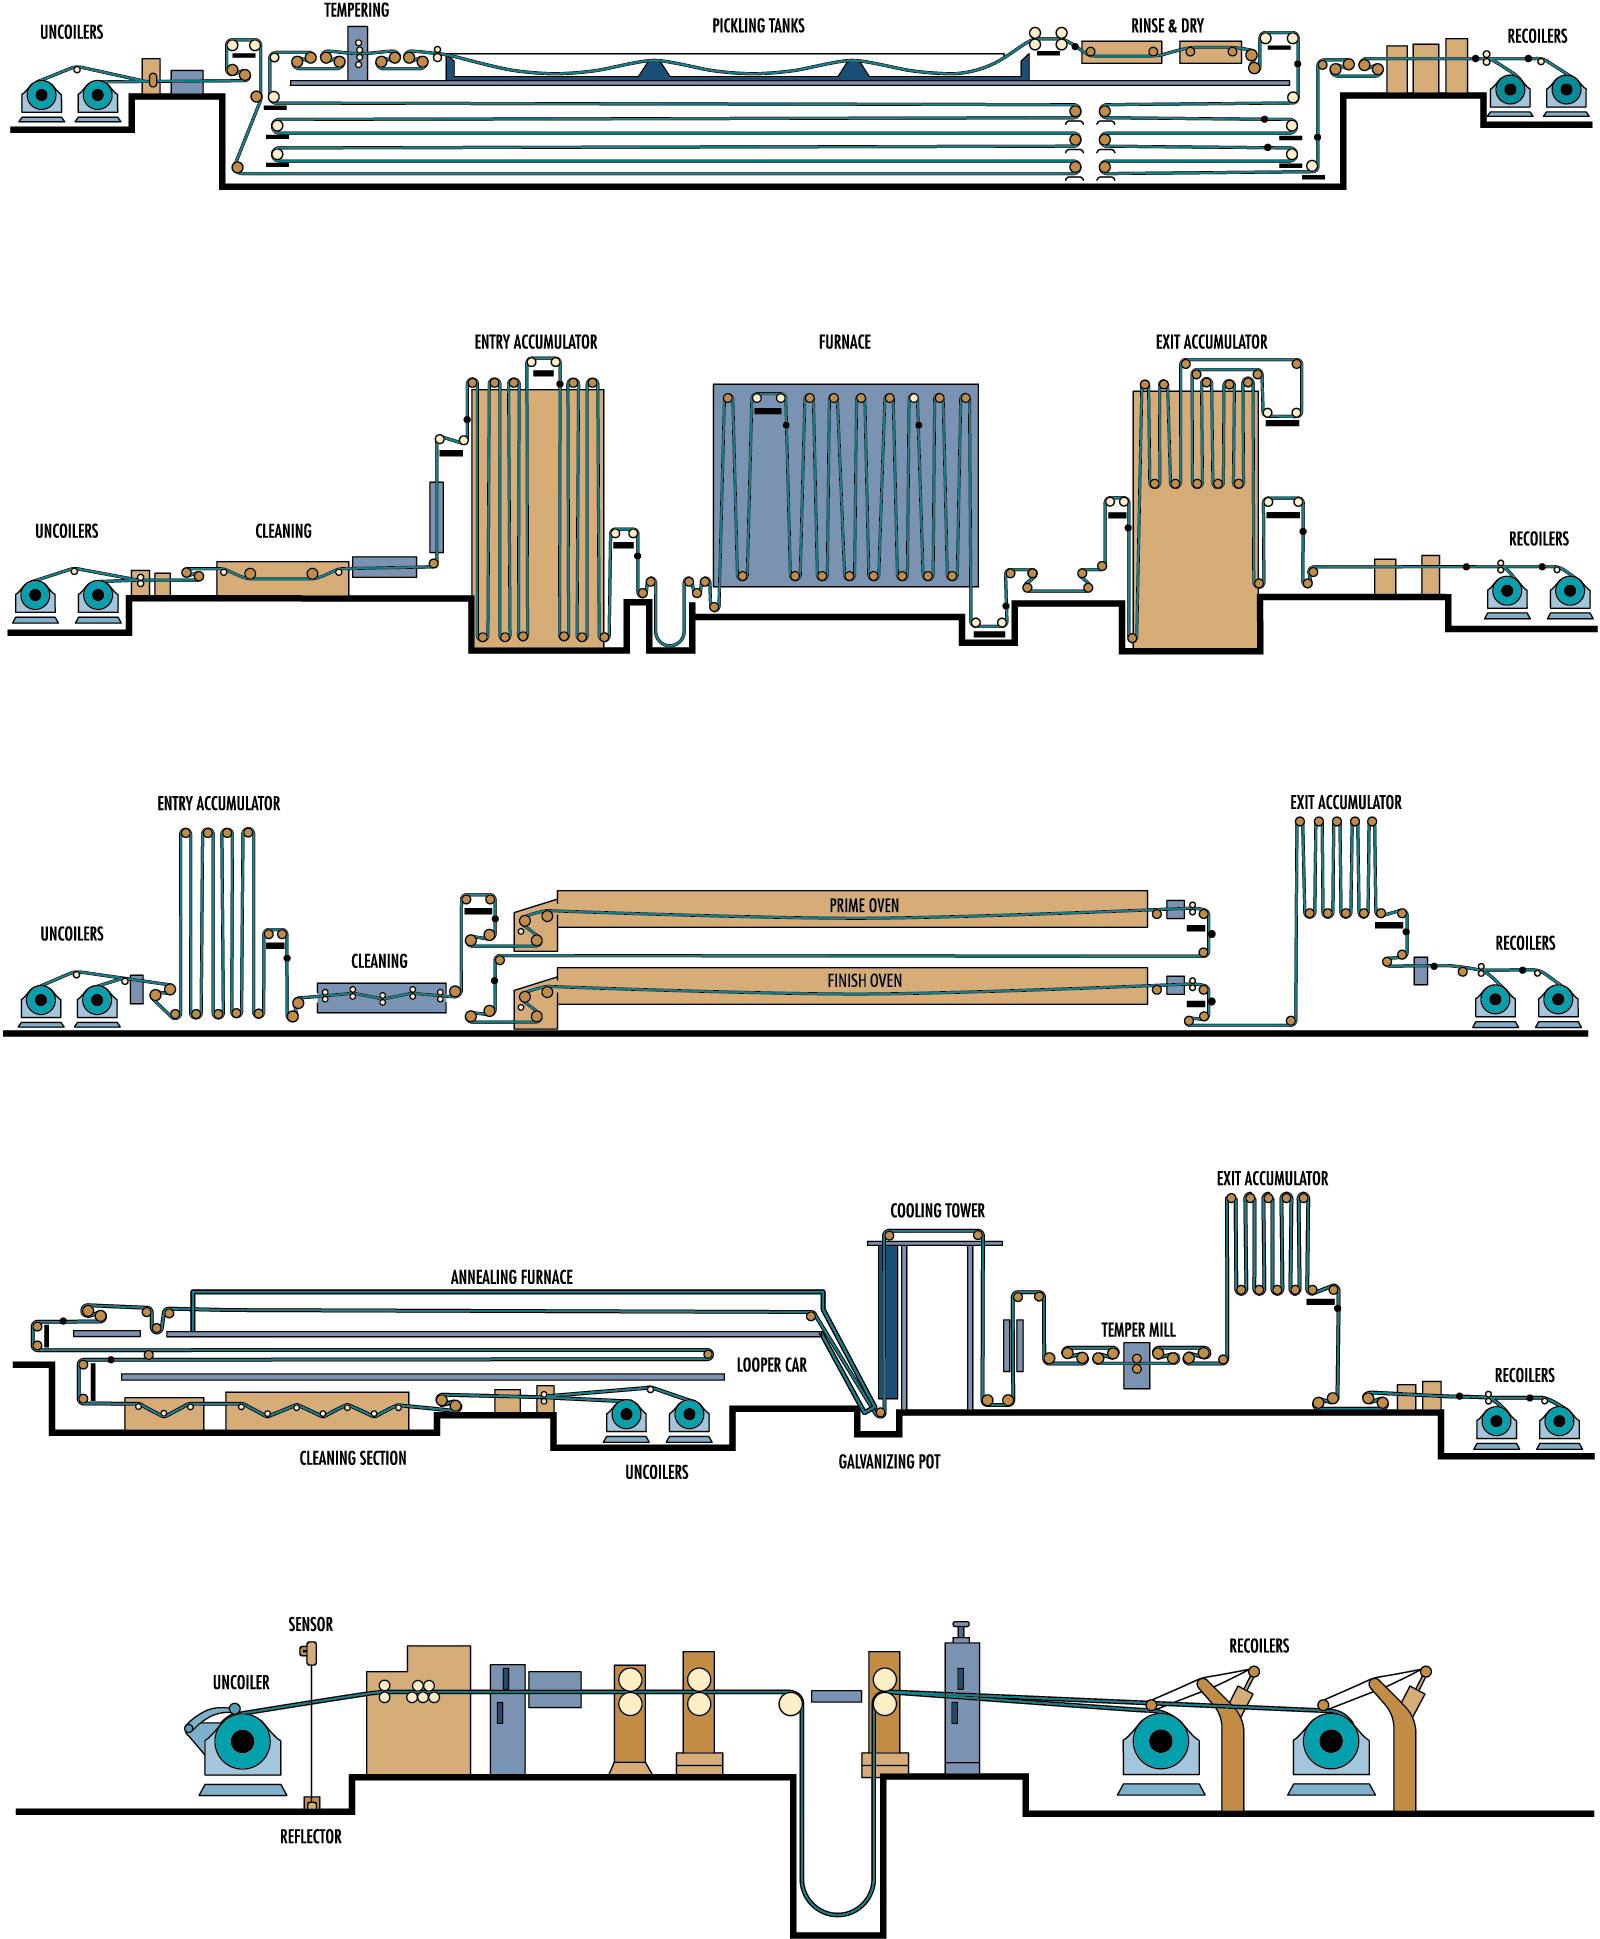 Typical Metals Process Line